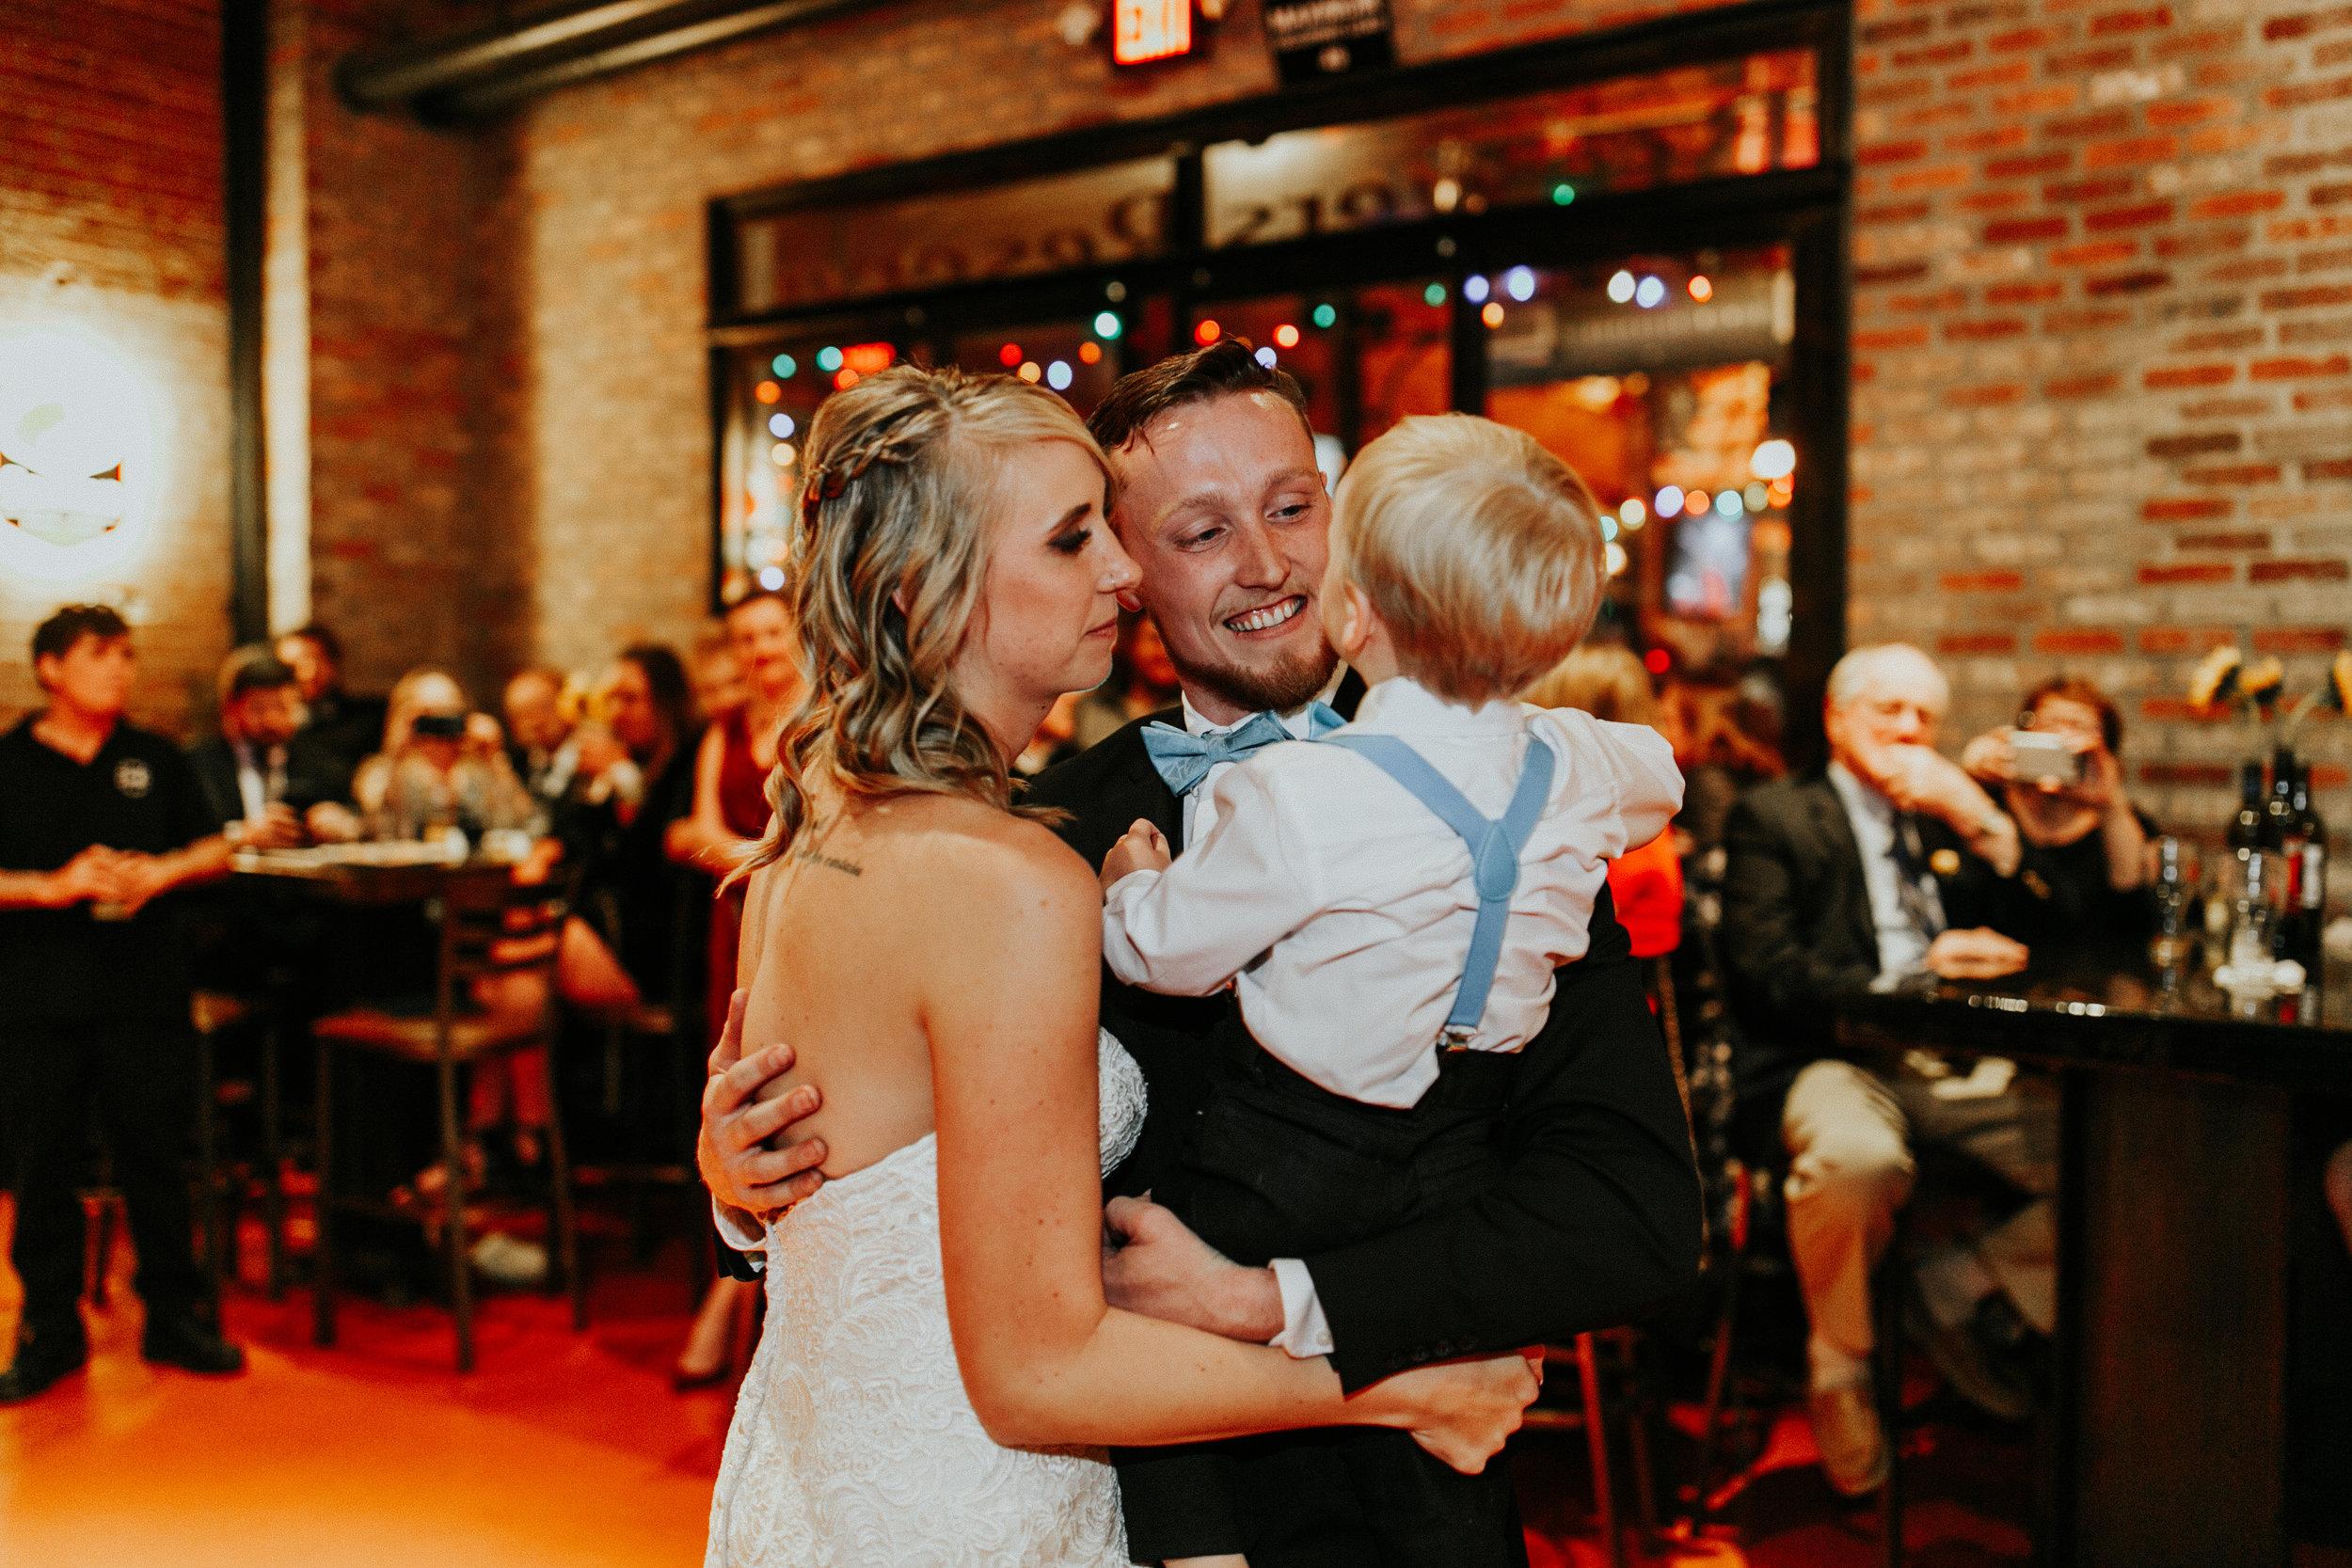 adventure-wedding-photographer-gracetphotography-56.jpg